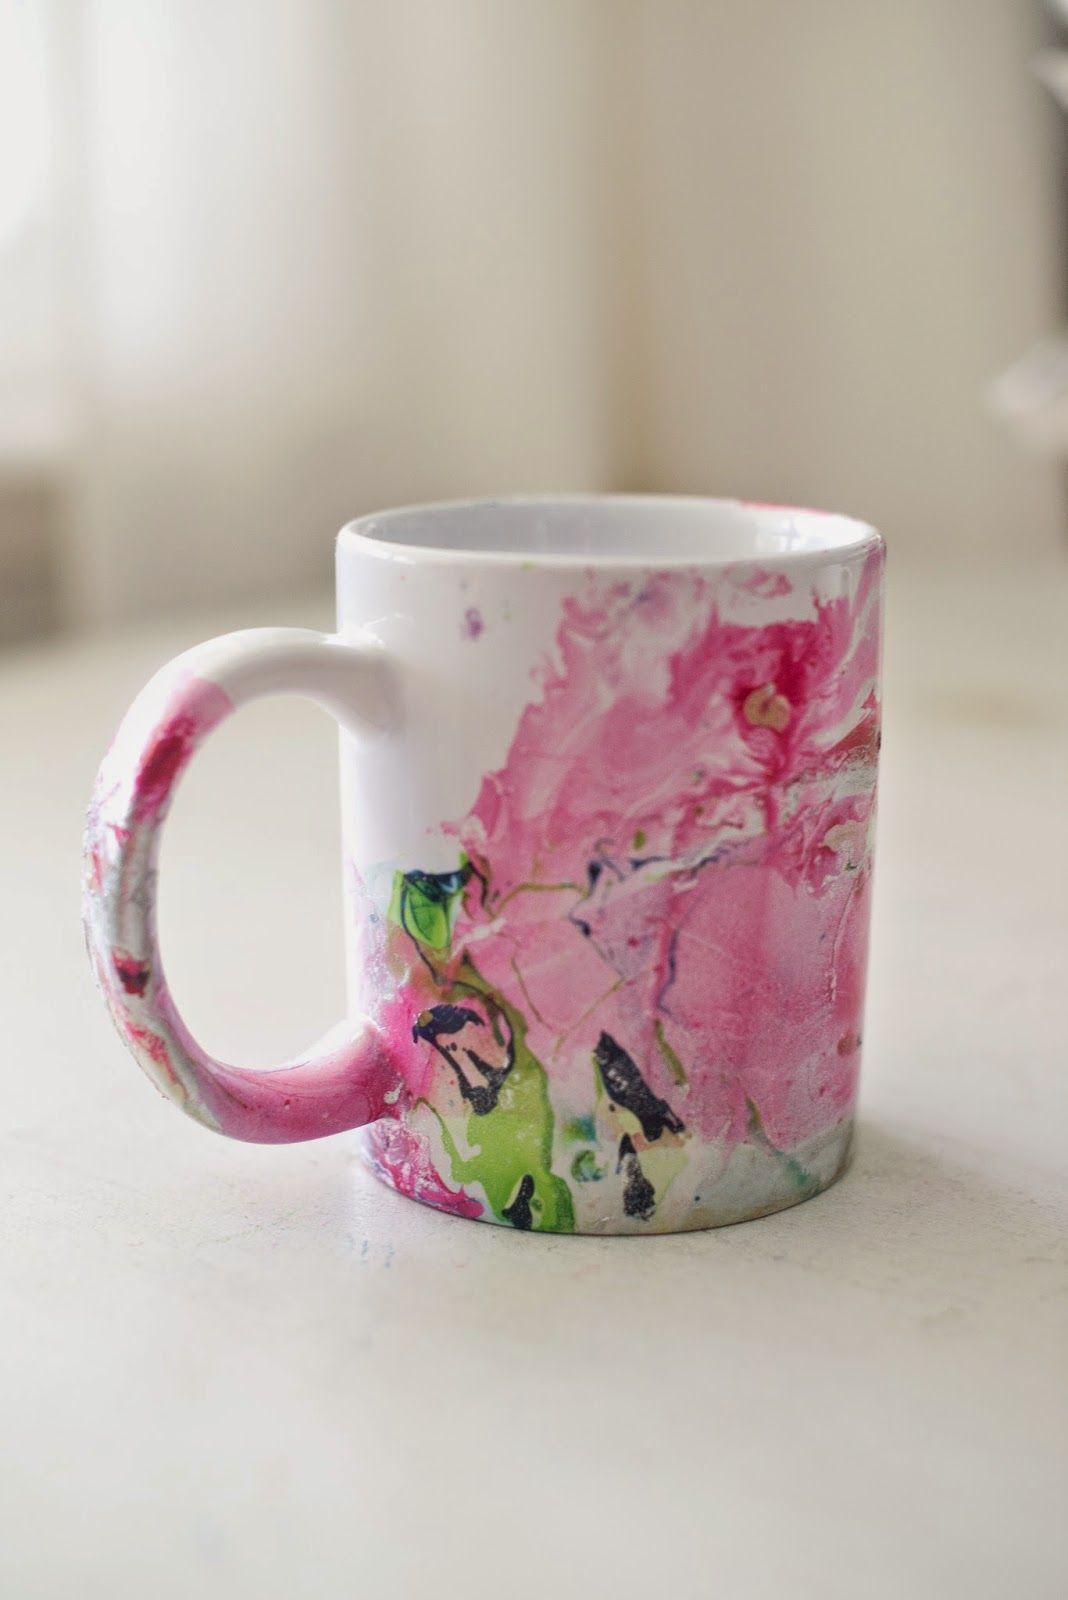 Diy Marbled Nail Polish Coffee Mugs Coffee Cup Crafts Nail Polish Crafts Nail Art Diy